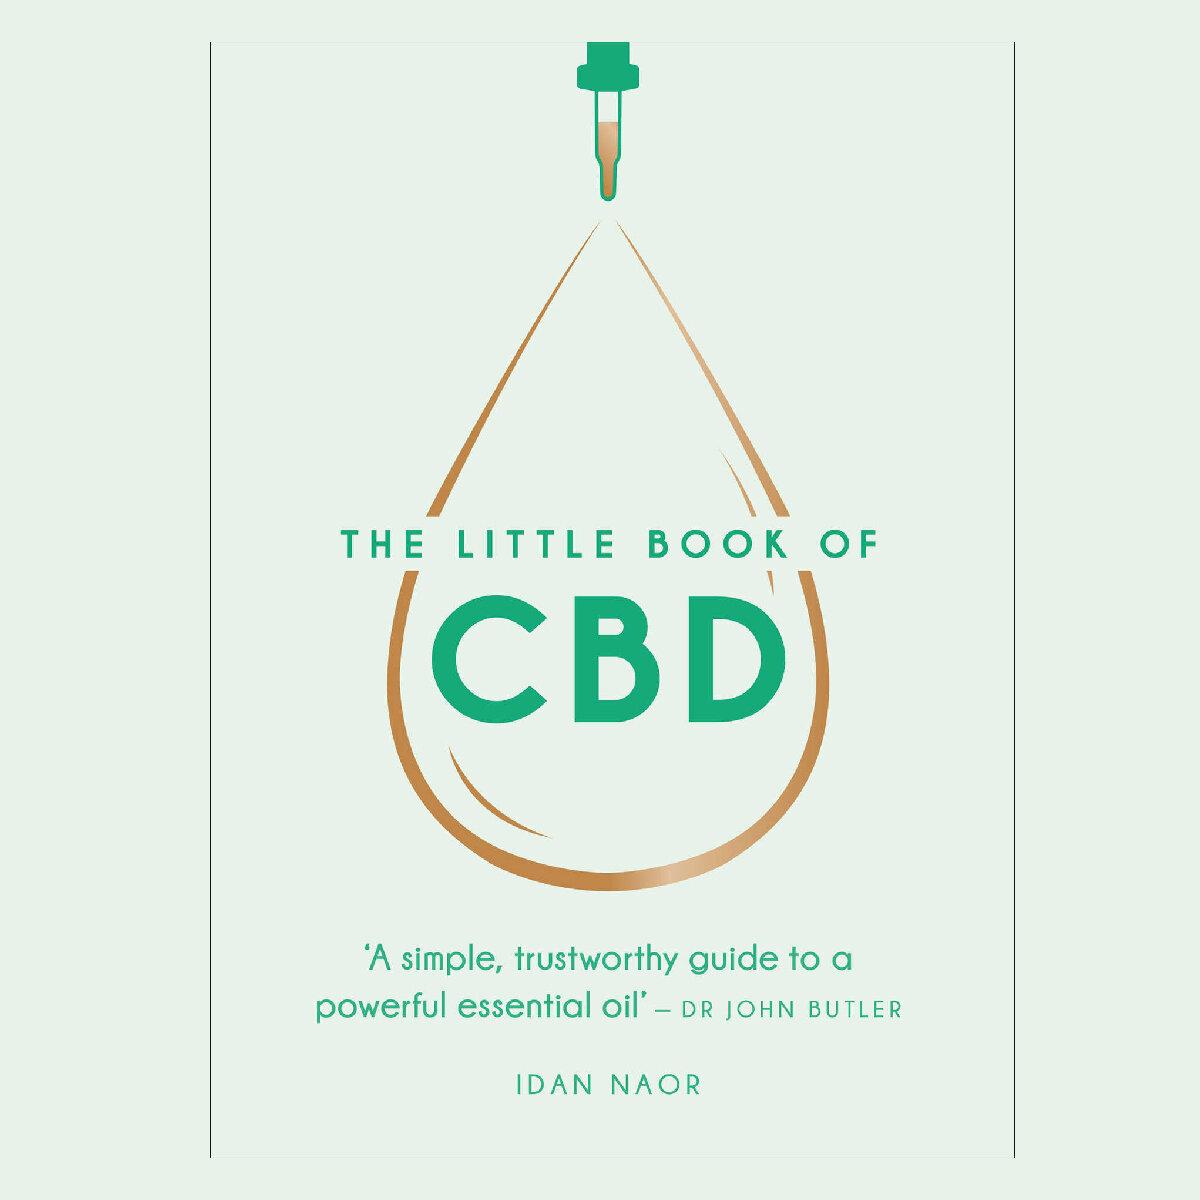 The Little Book of CBD by Idan Naor